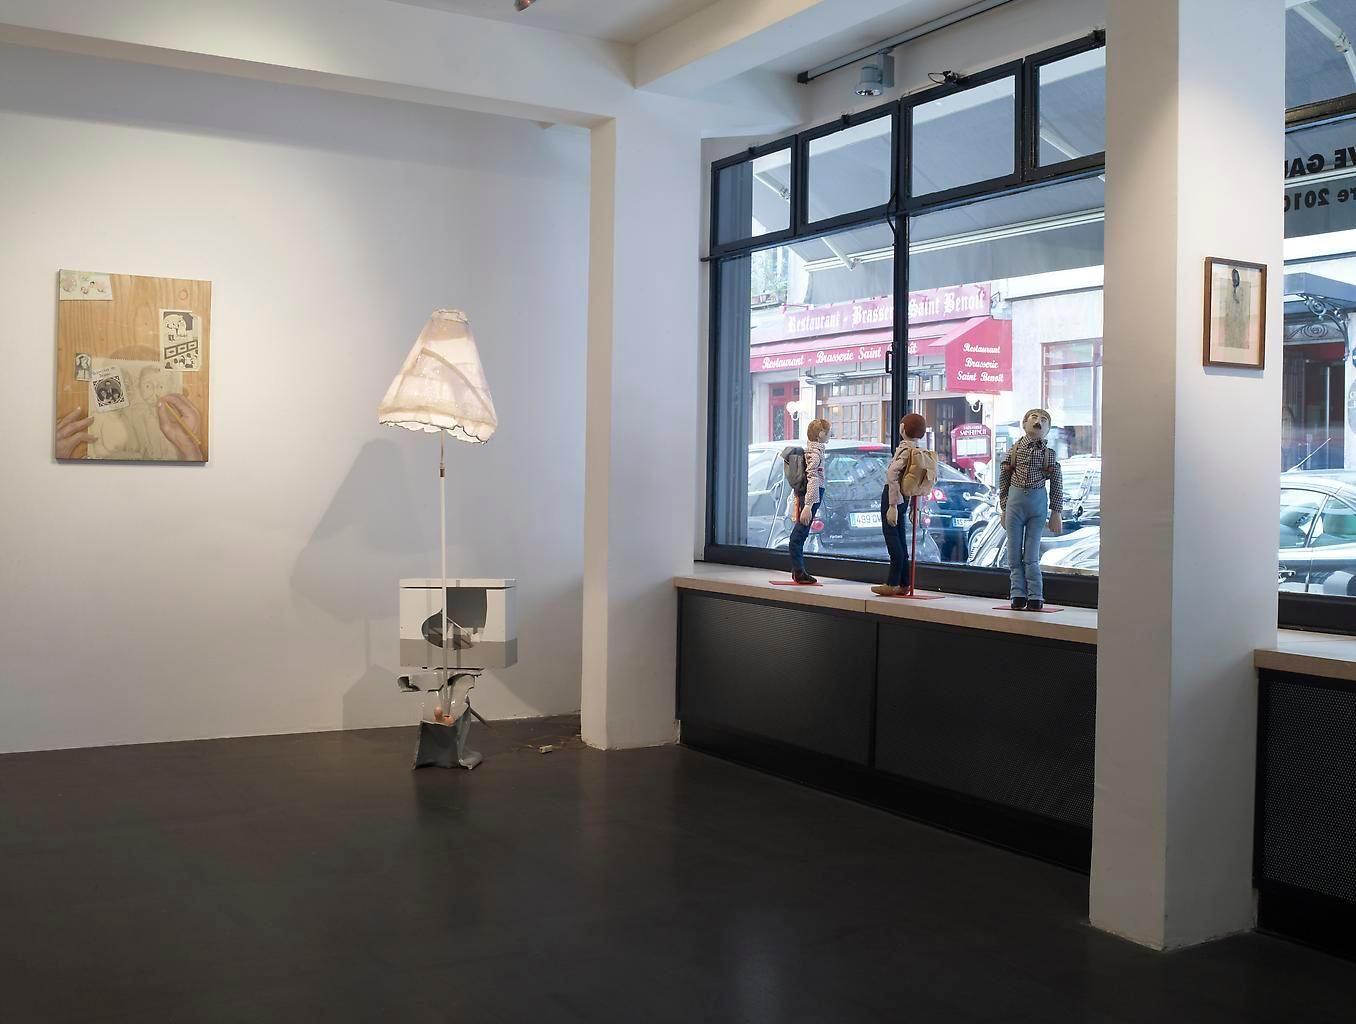 Installation view, Rive Gauche / Rive Droite, Catherine Houard, Paris, September 9 - September 25, 2010